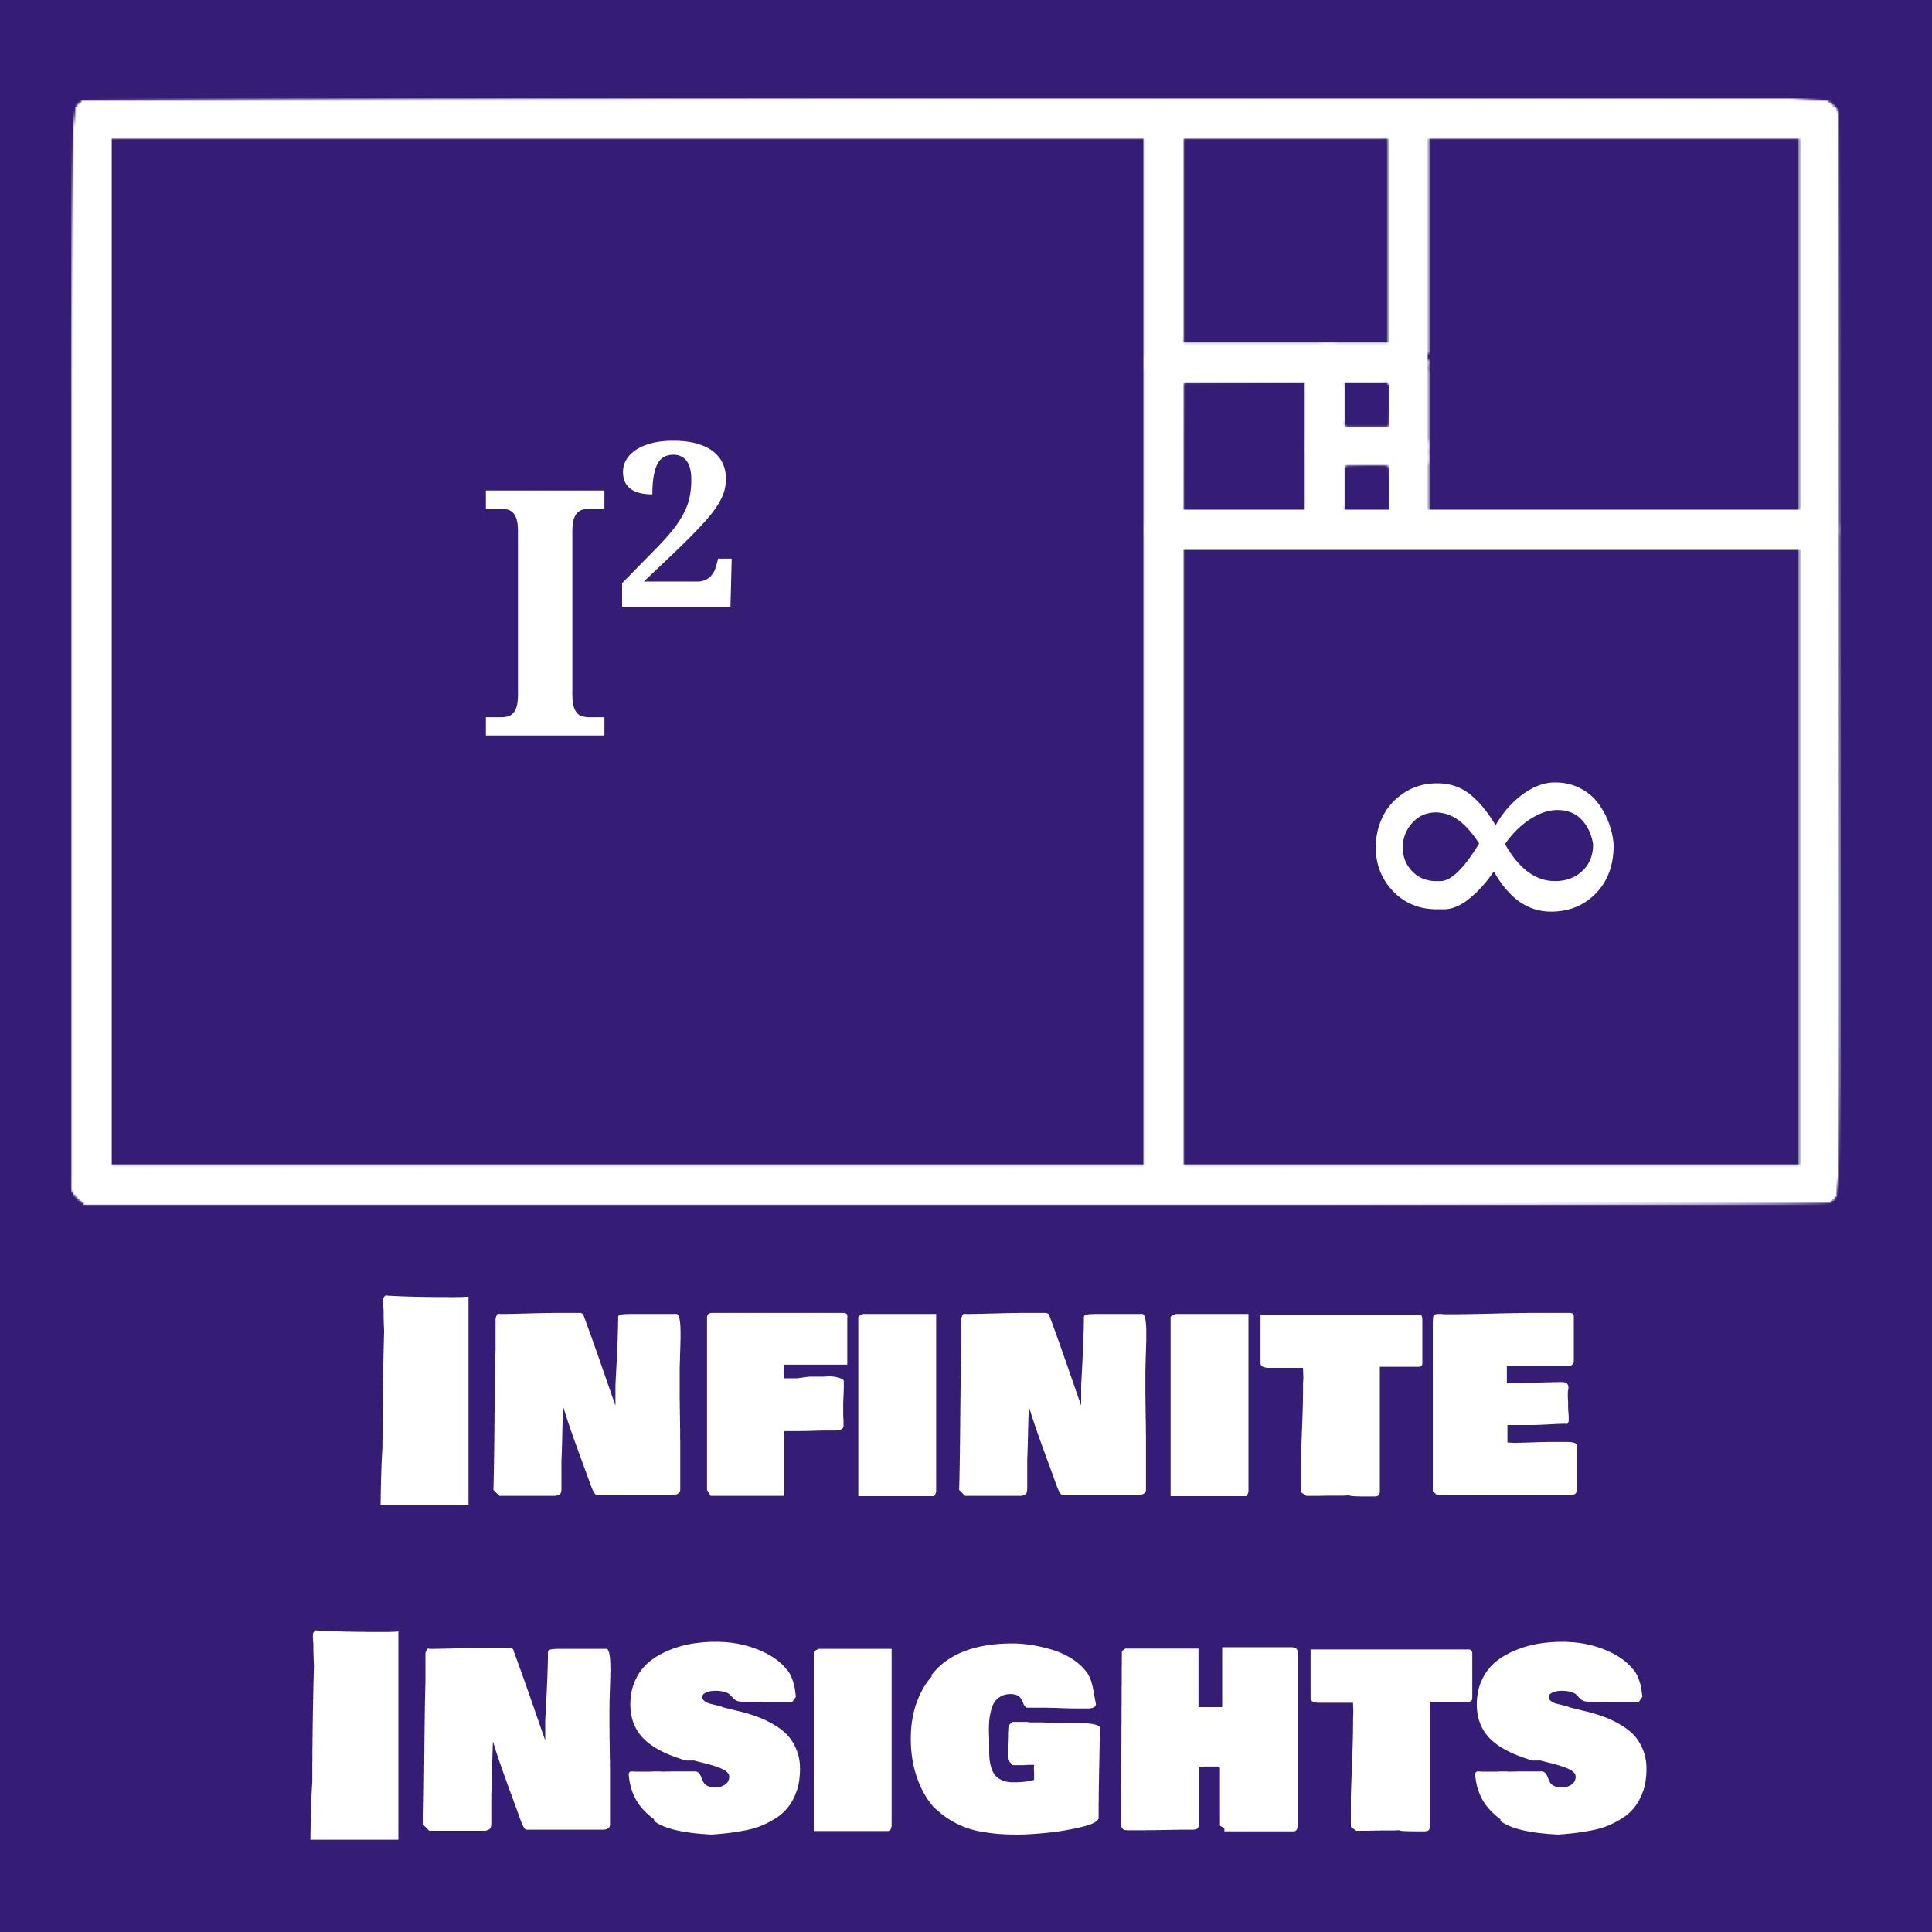 Infinite Insights